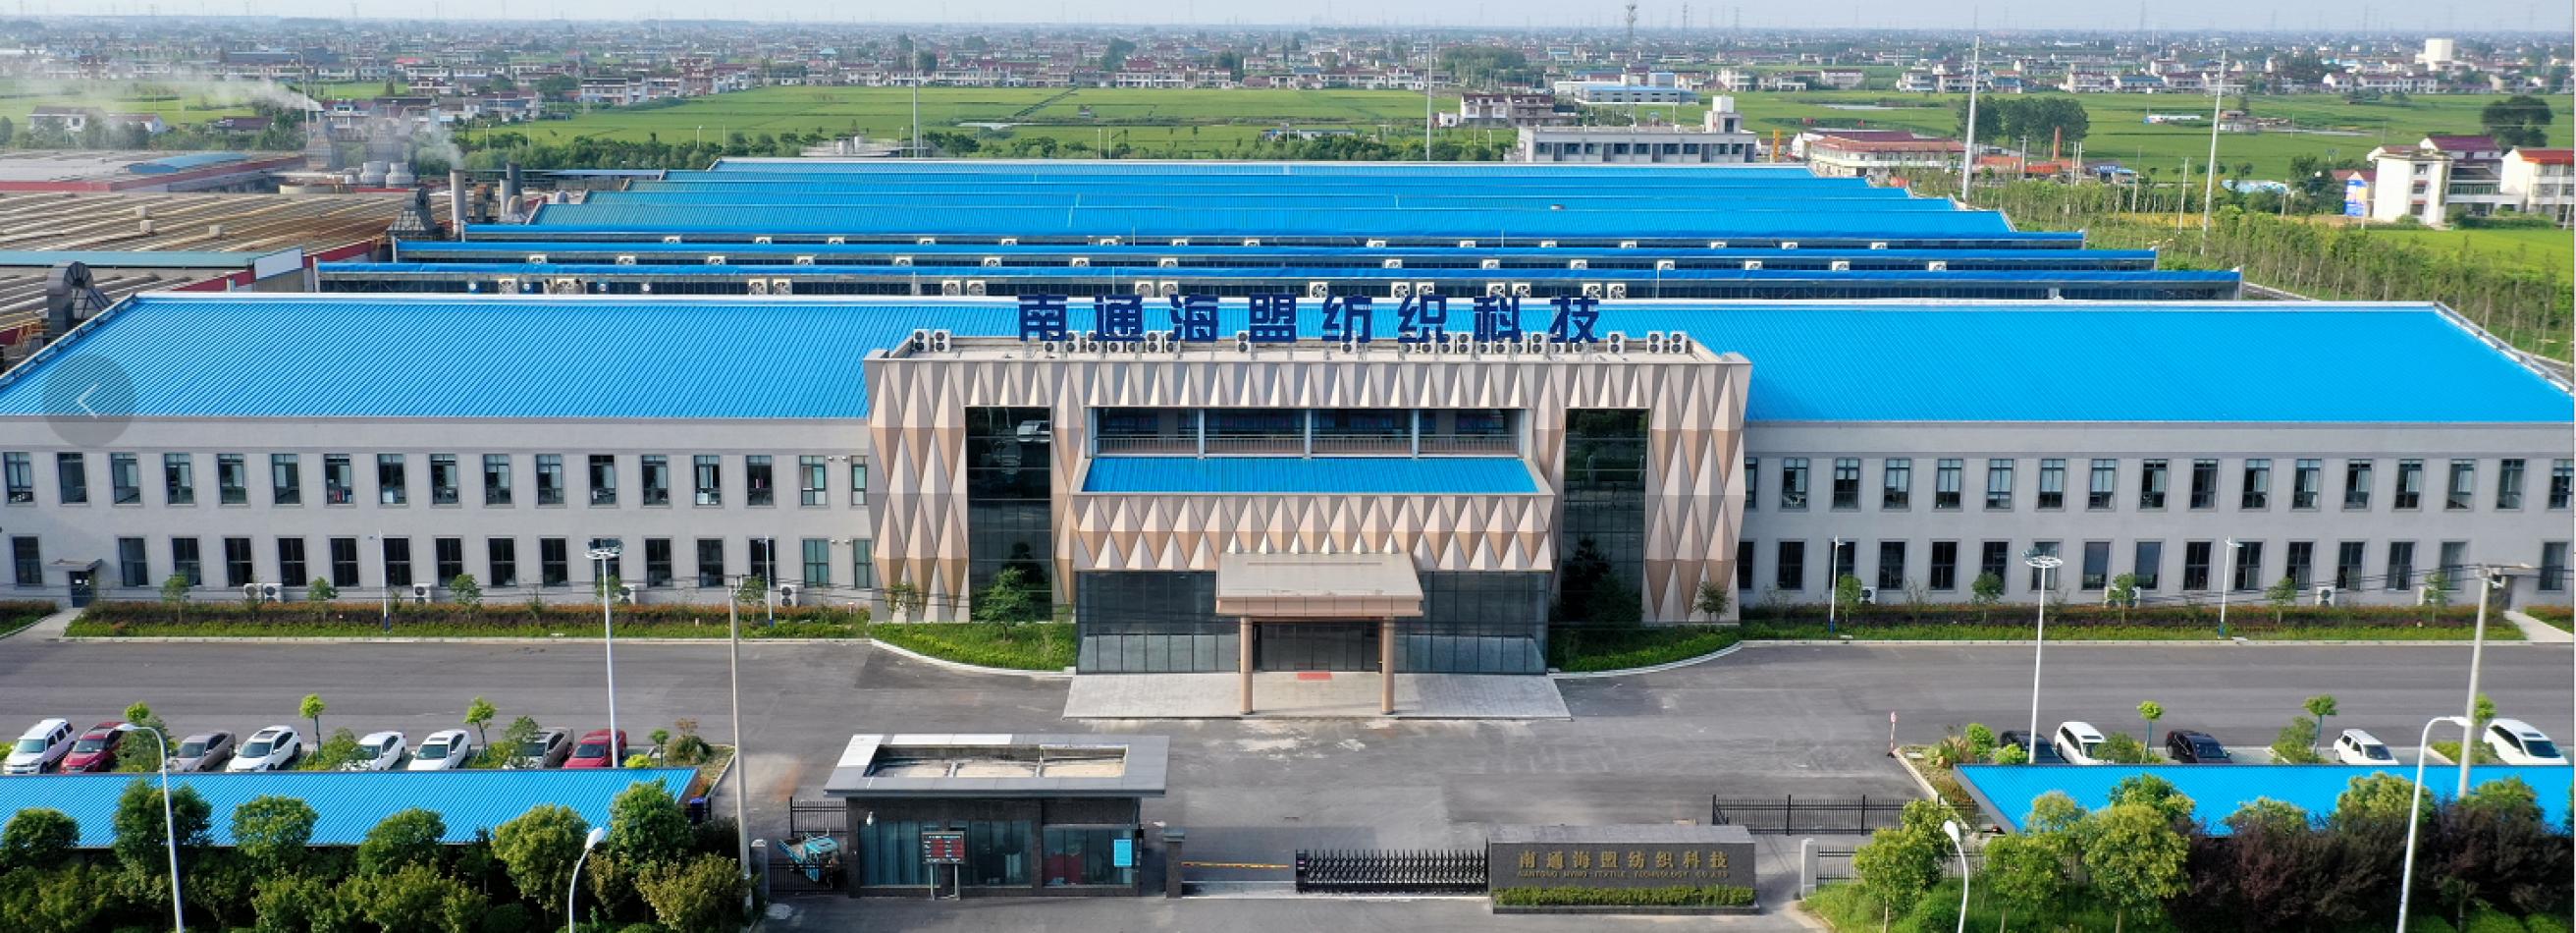 Nantong Hymo Textile Technology Co., Ltd / Nantong Hymo Industrial Corp.